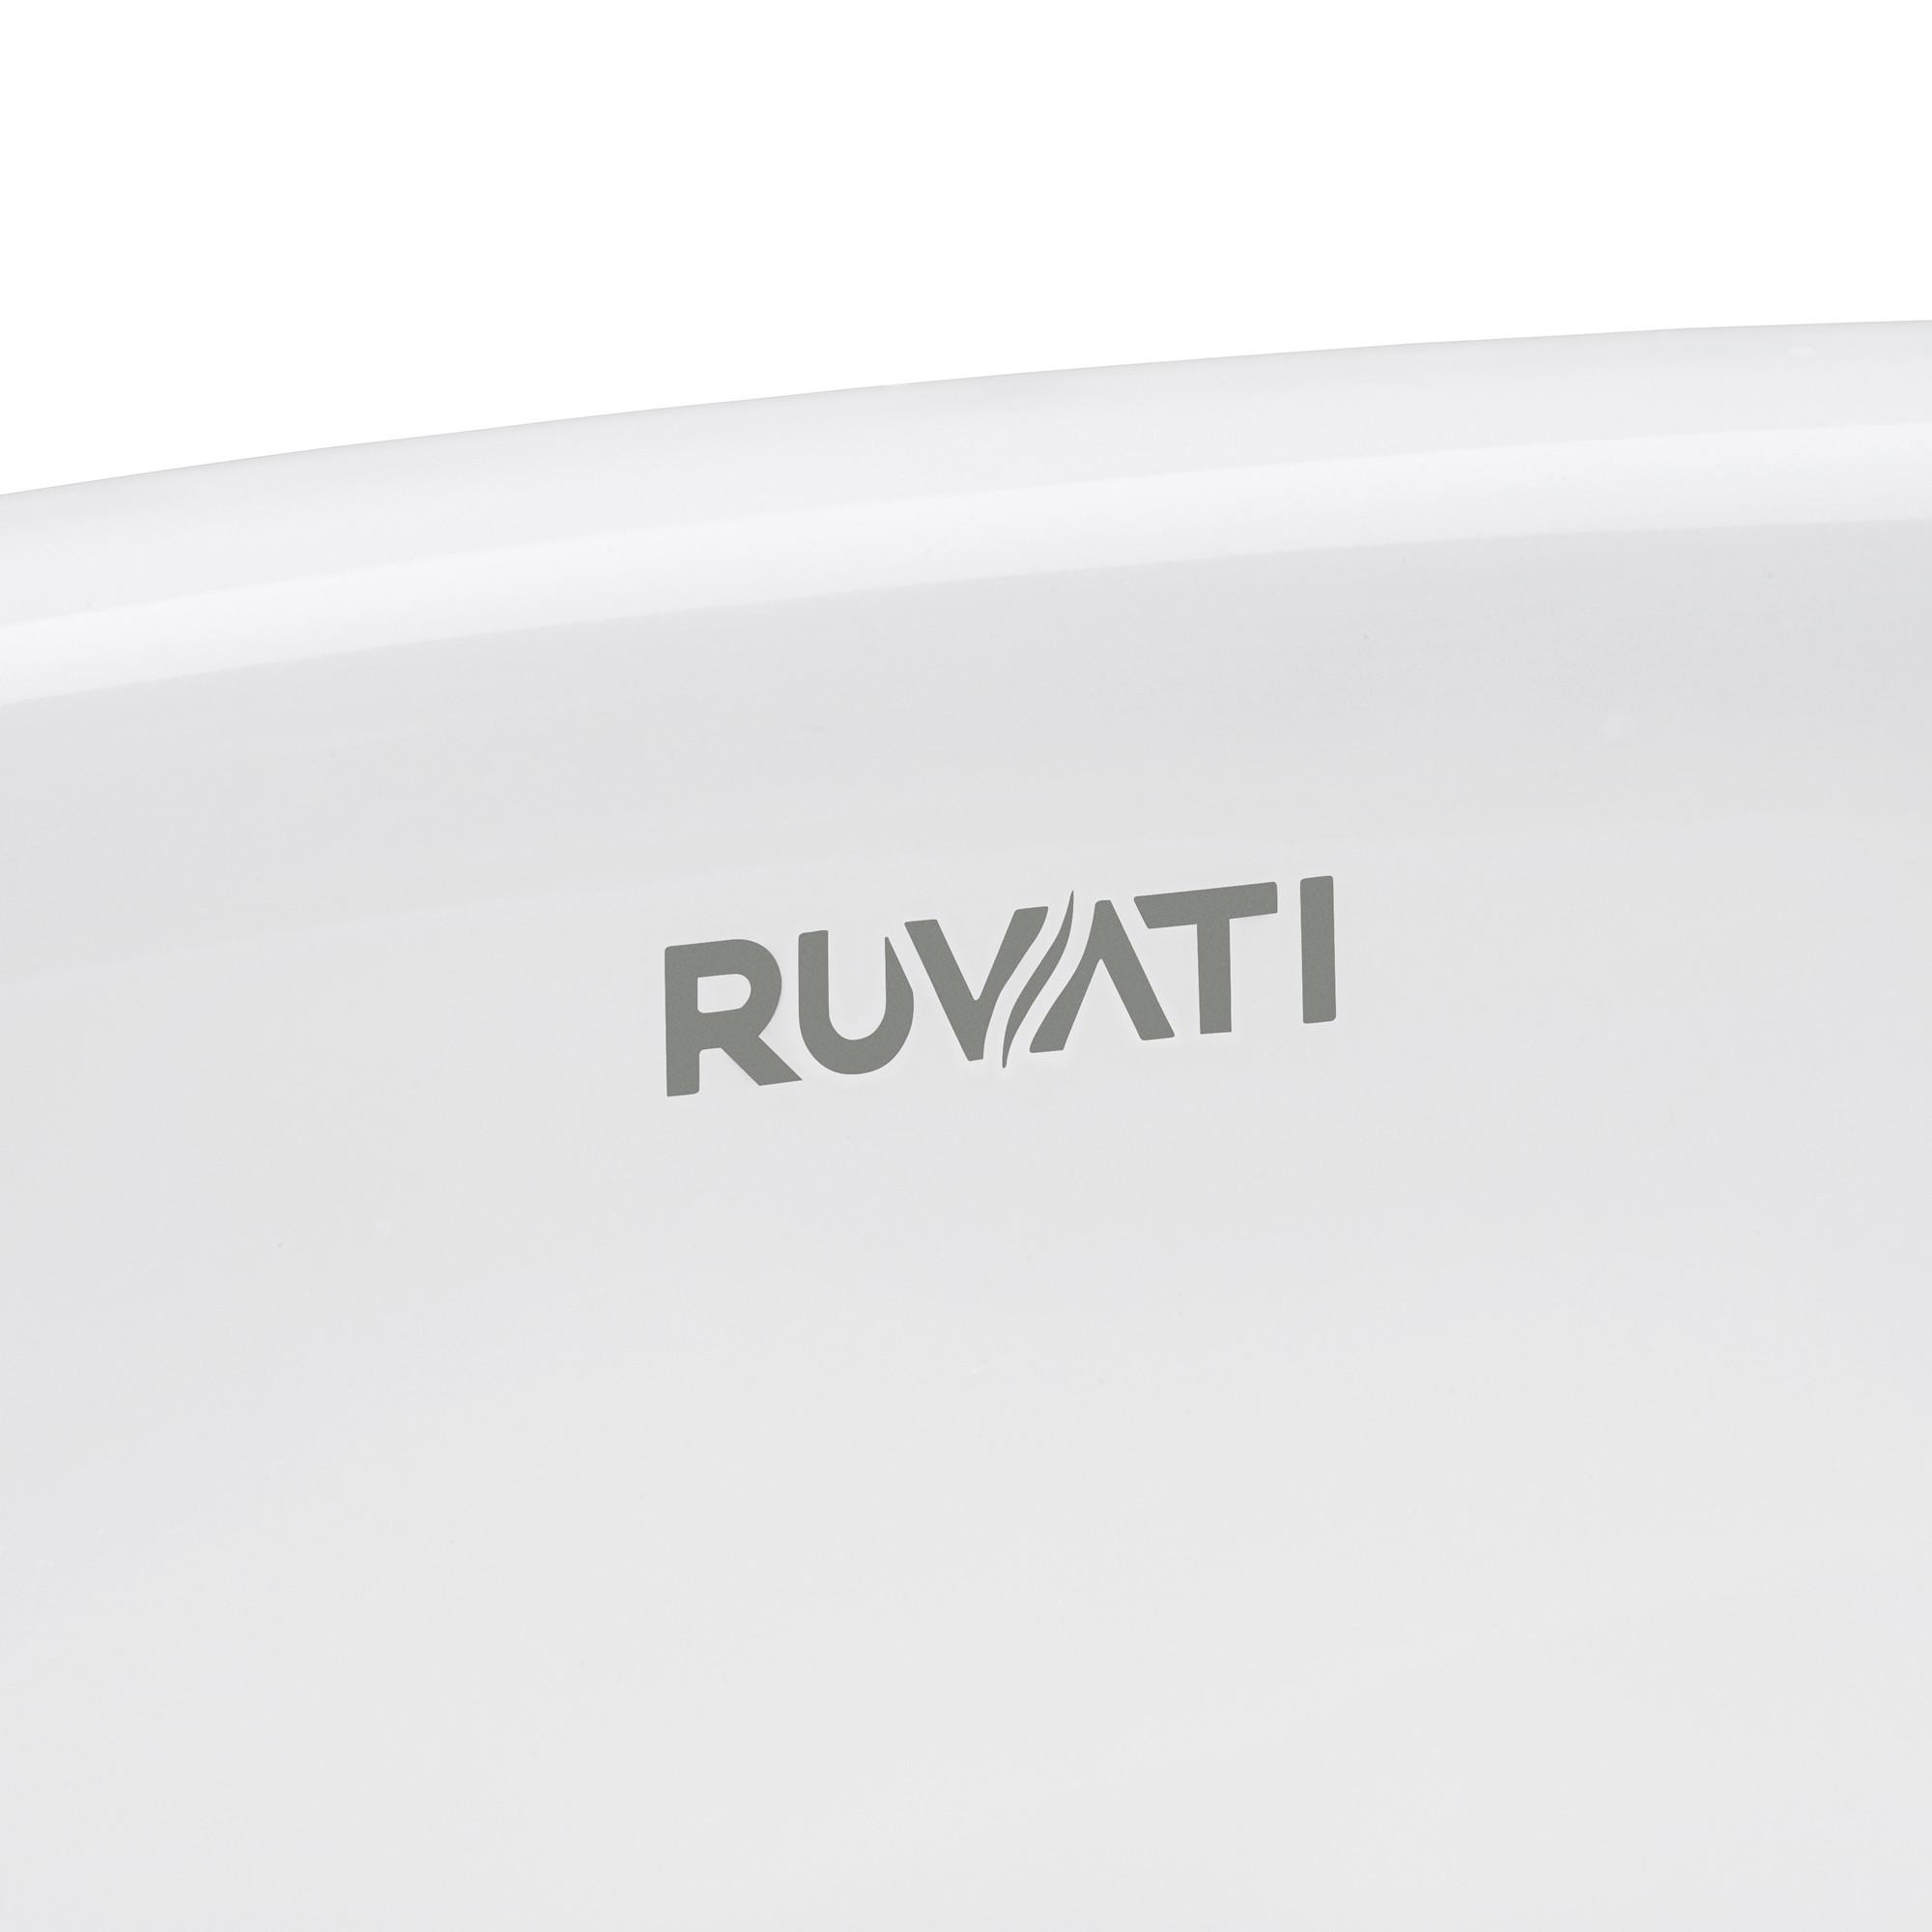 Ruvati RVB0616 15 x 12 Inch Undermount Bathroom Vanity ...